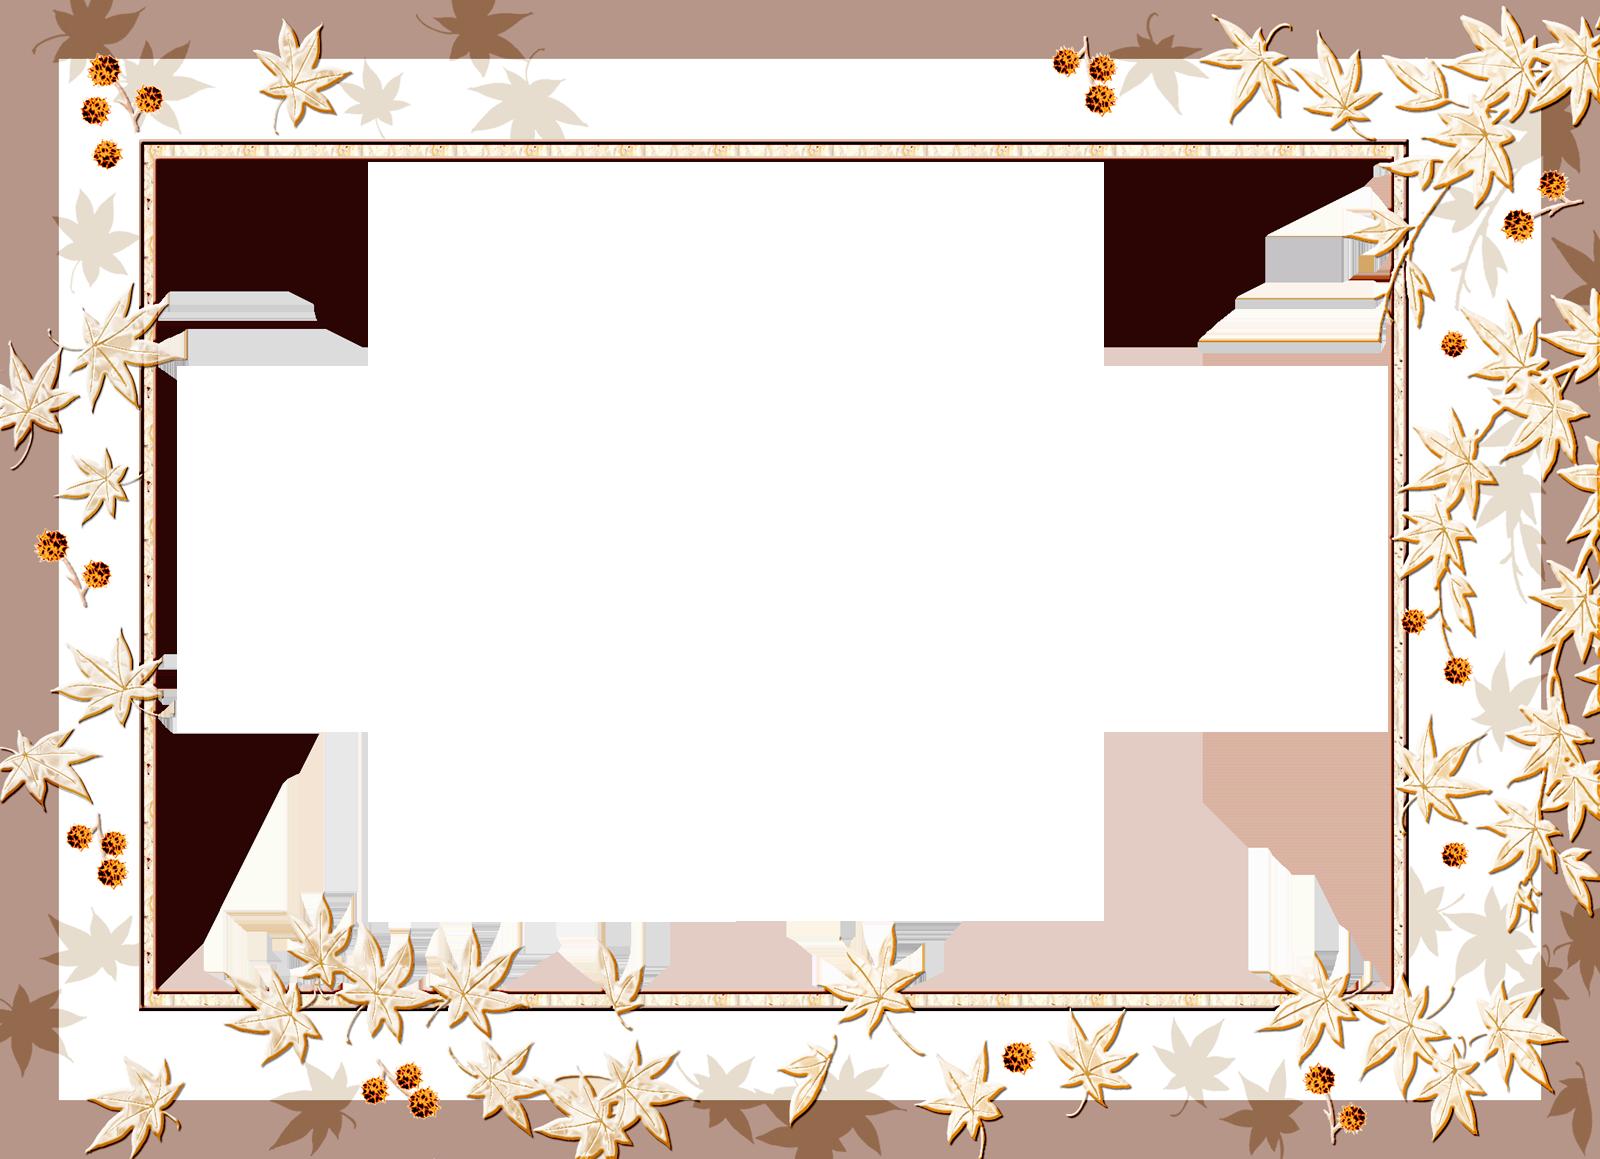 Рамка для фото картинки на прозрачном фоне, открытки папе днем